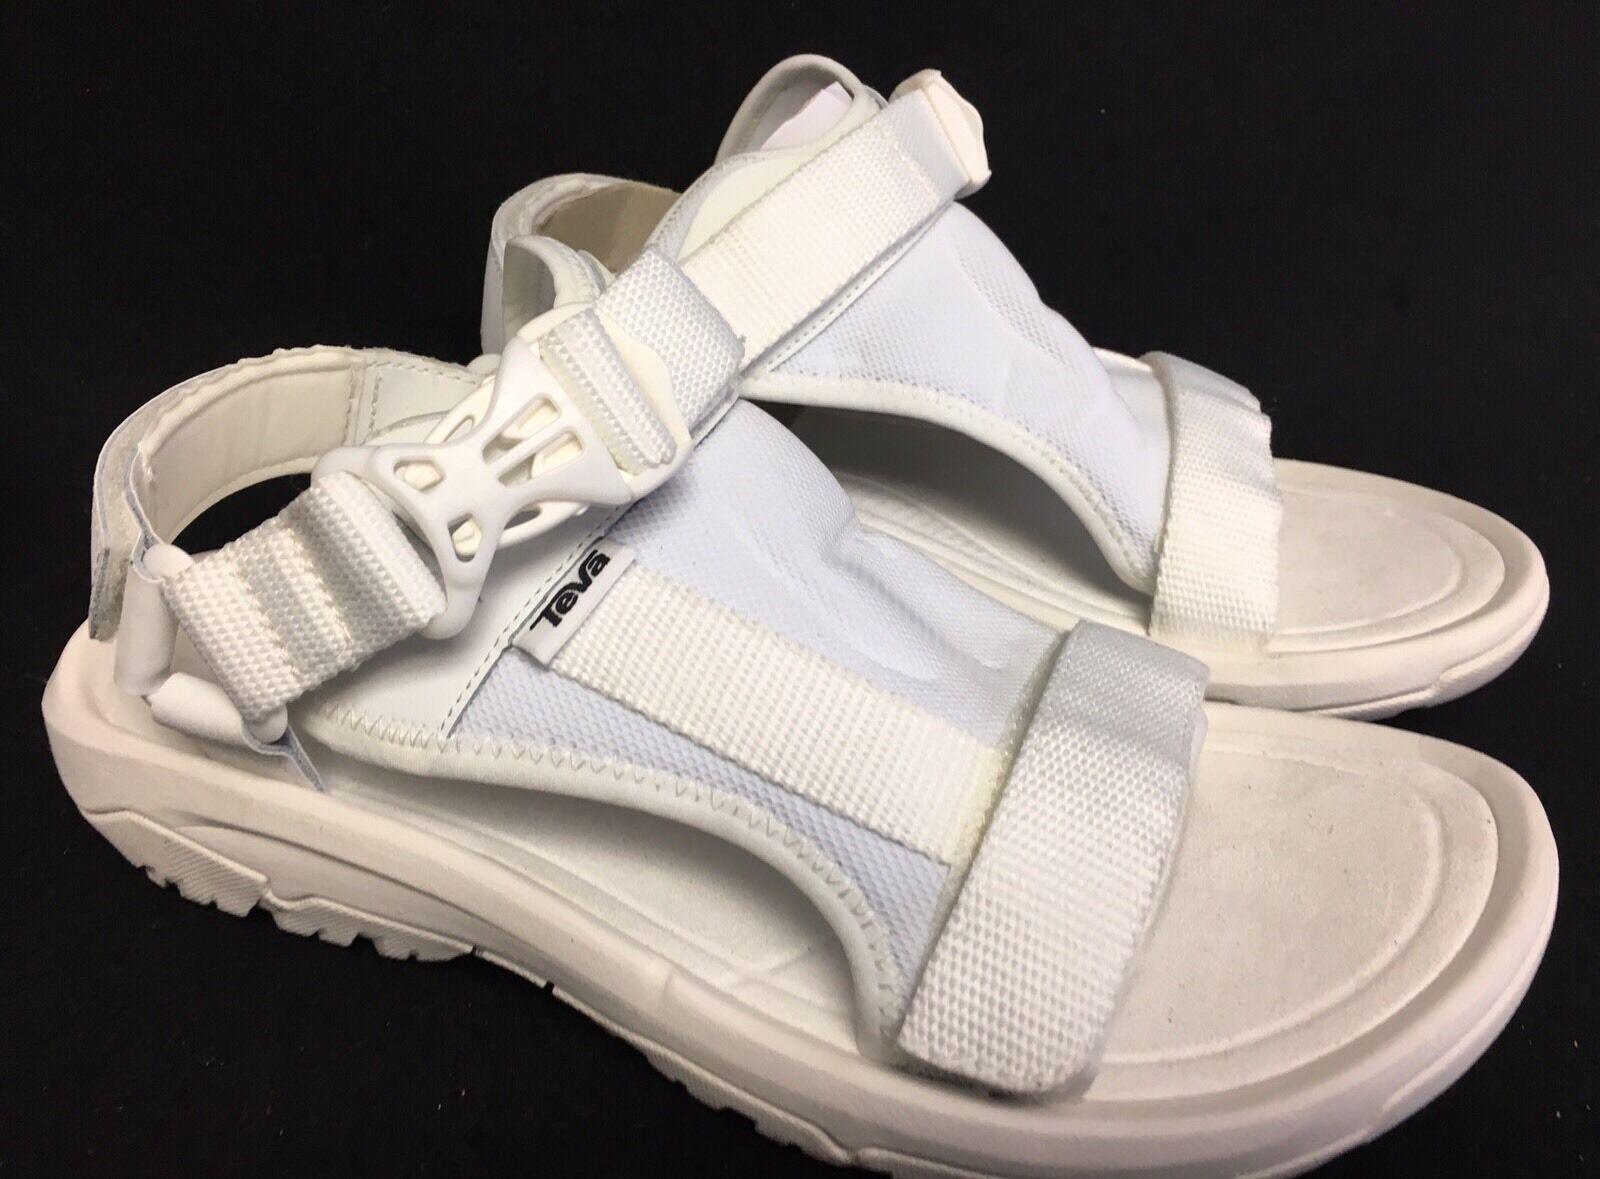 Teva Huracán voltios blancoo blancoo blancoo Sport Water Sandalias De Tiras Para Hombres Talla 9 1015224  auténtico